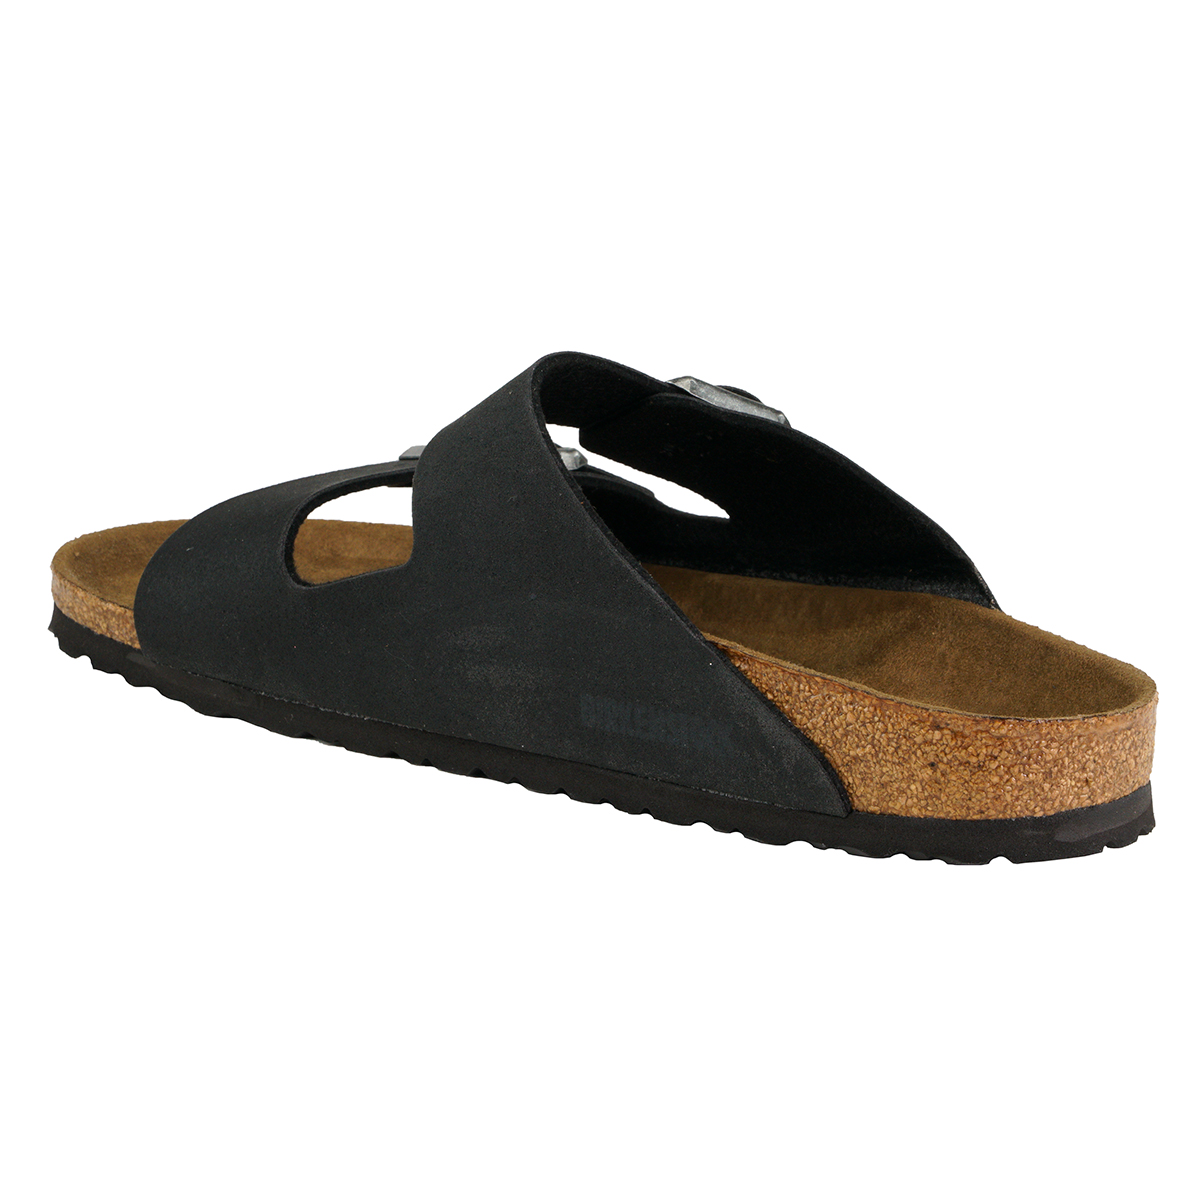 Birkenstock-Arizona-Sandals thumbnail 6